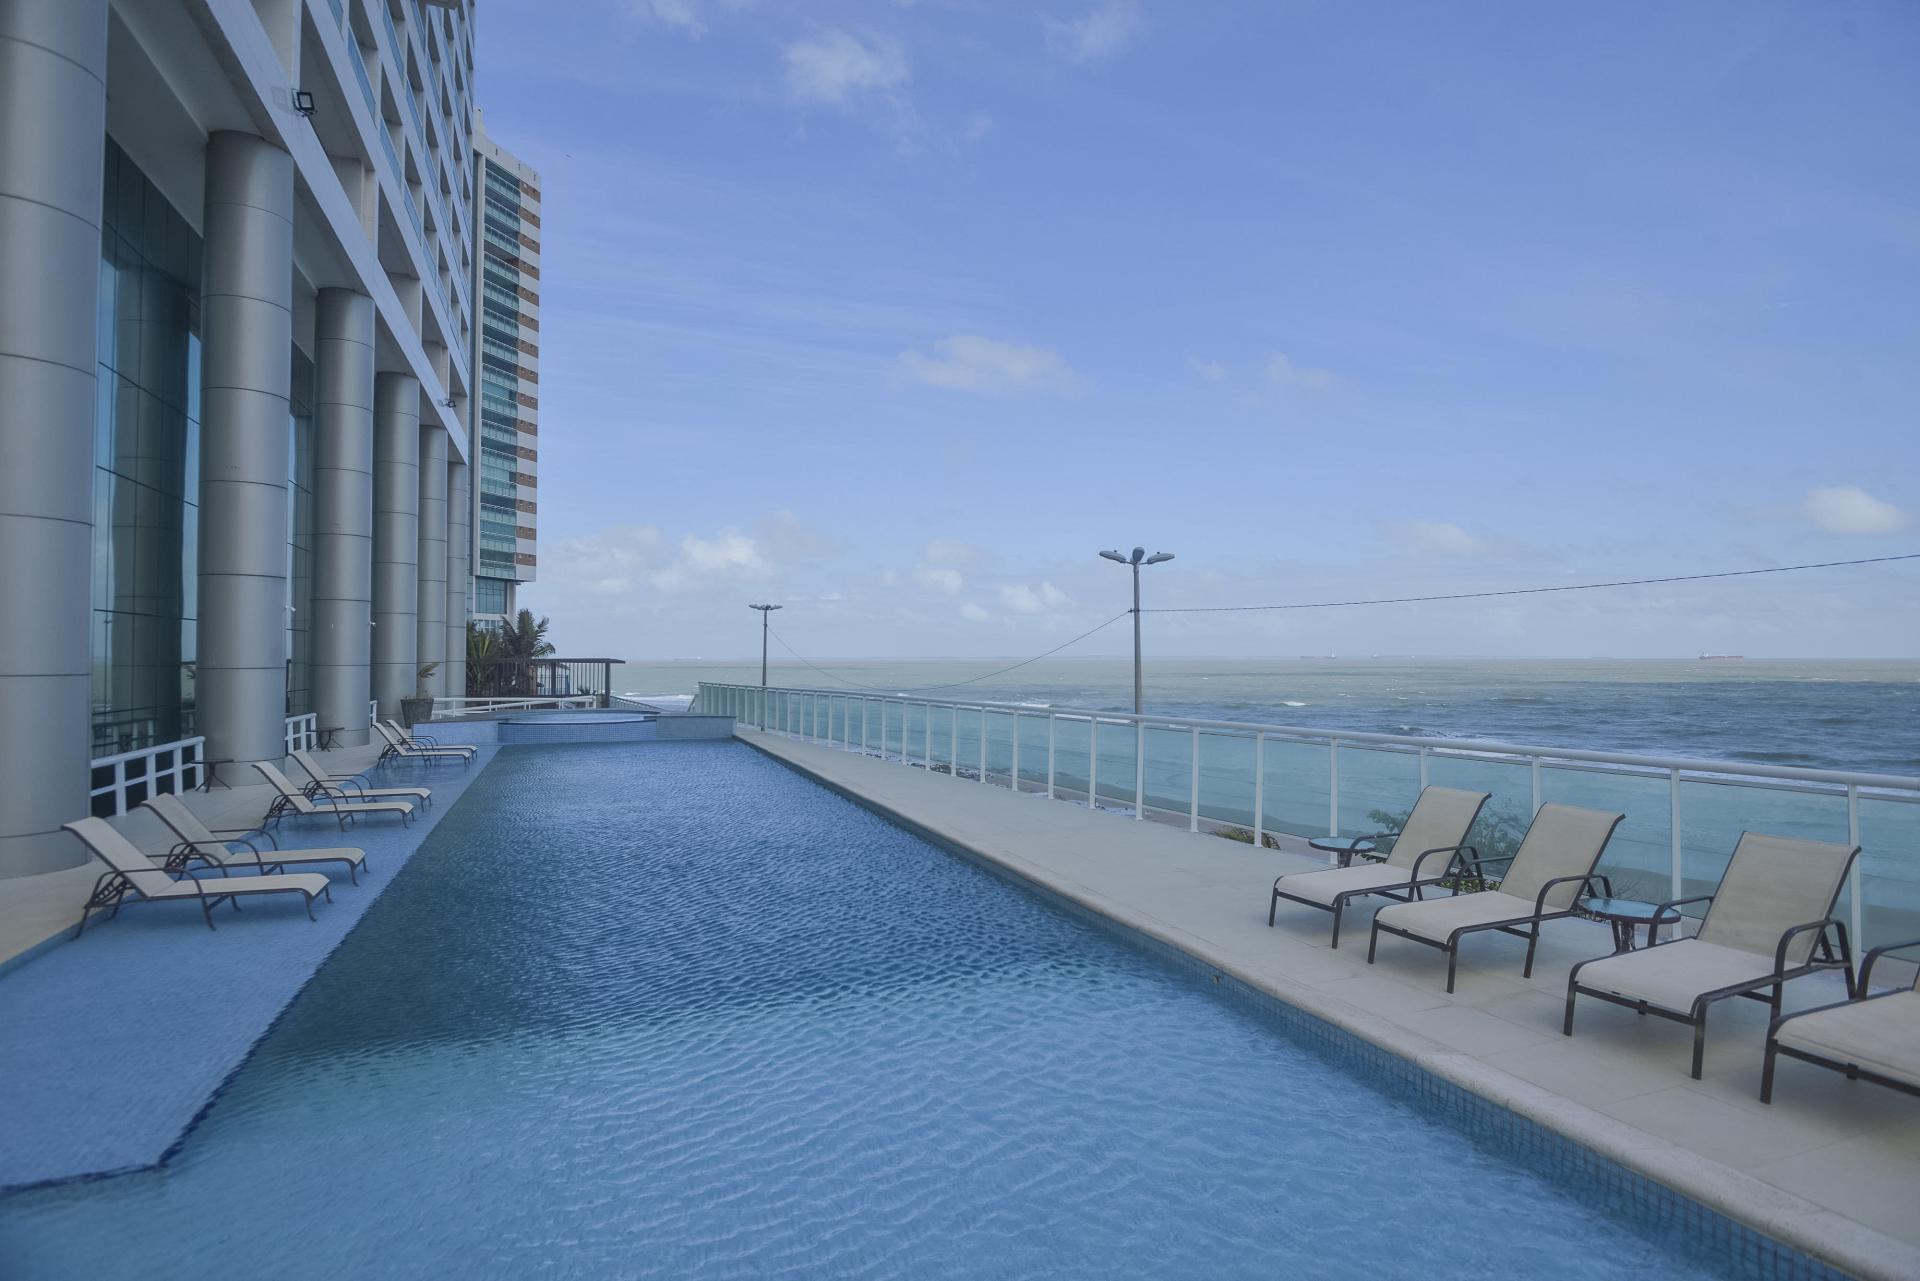 Pool with seaview at Hotel Luzeiros in Sao Luis do Maranhao, Brazil